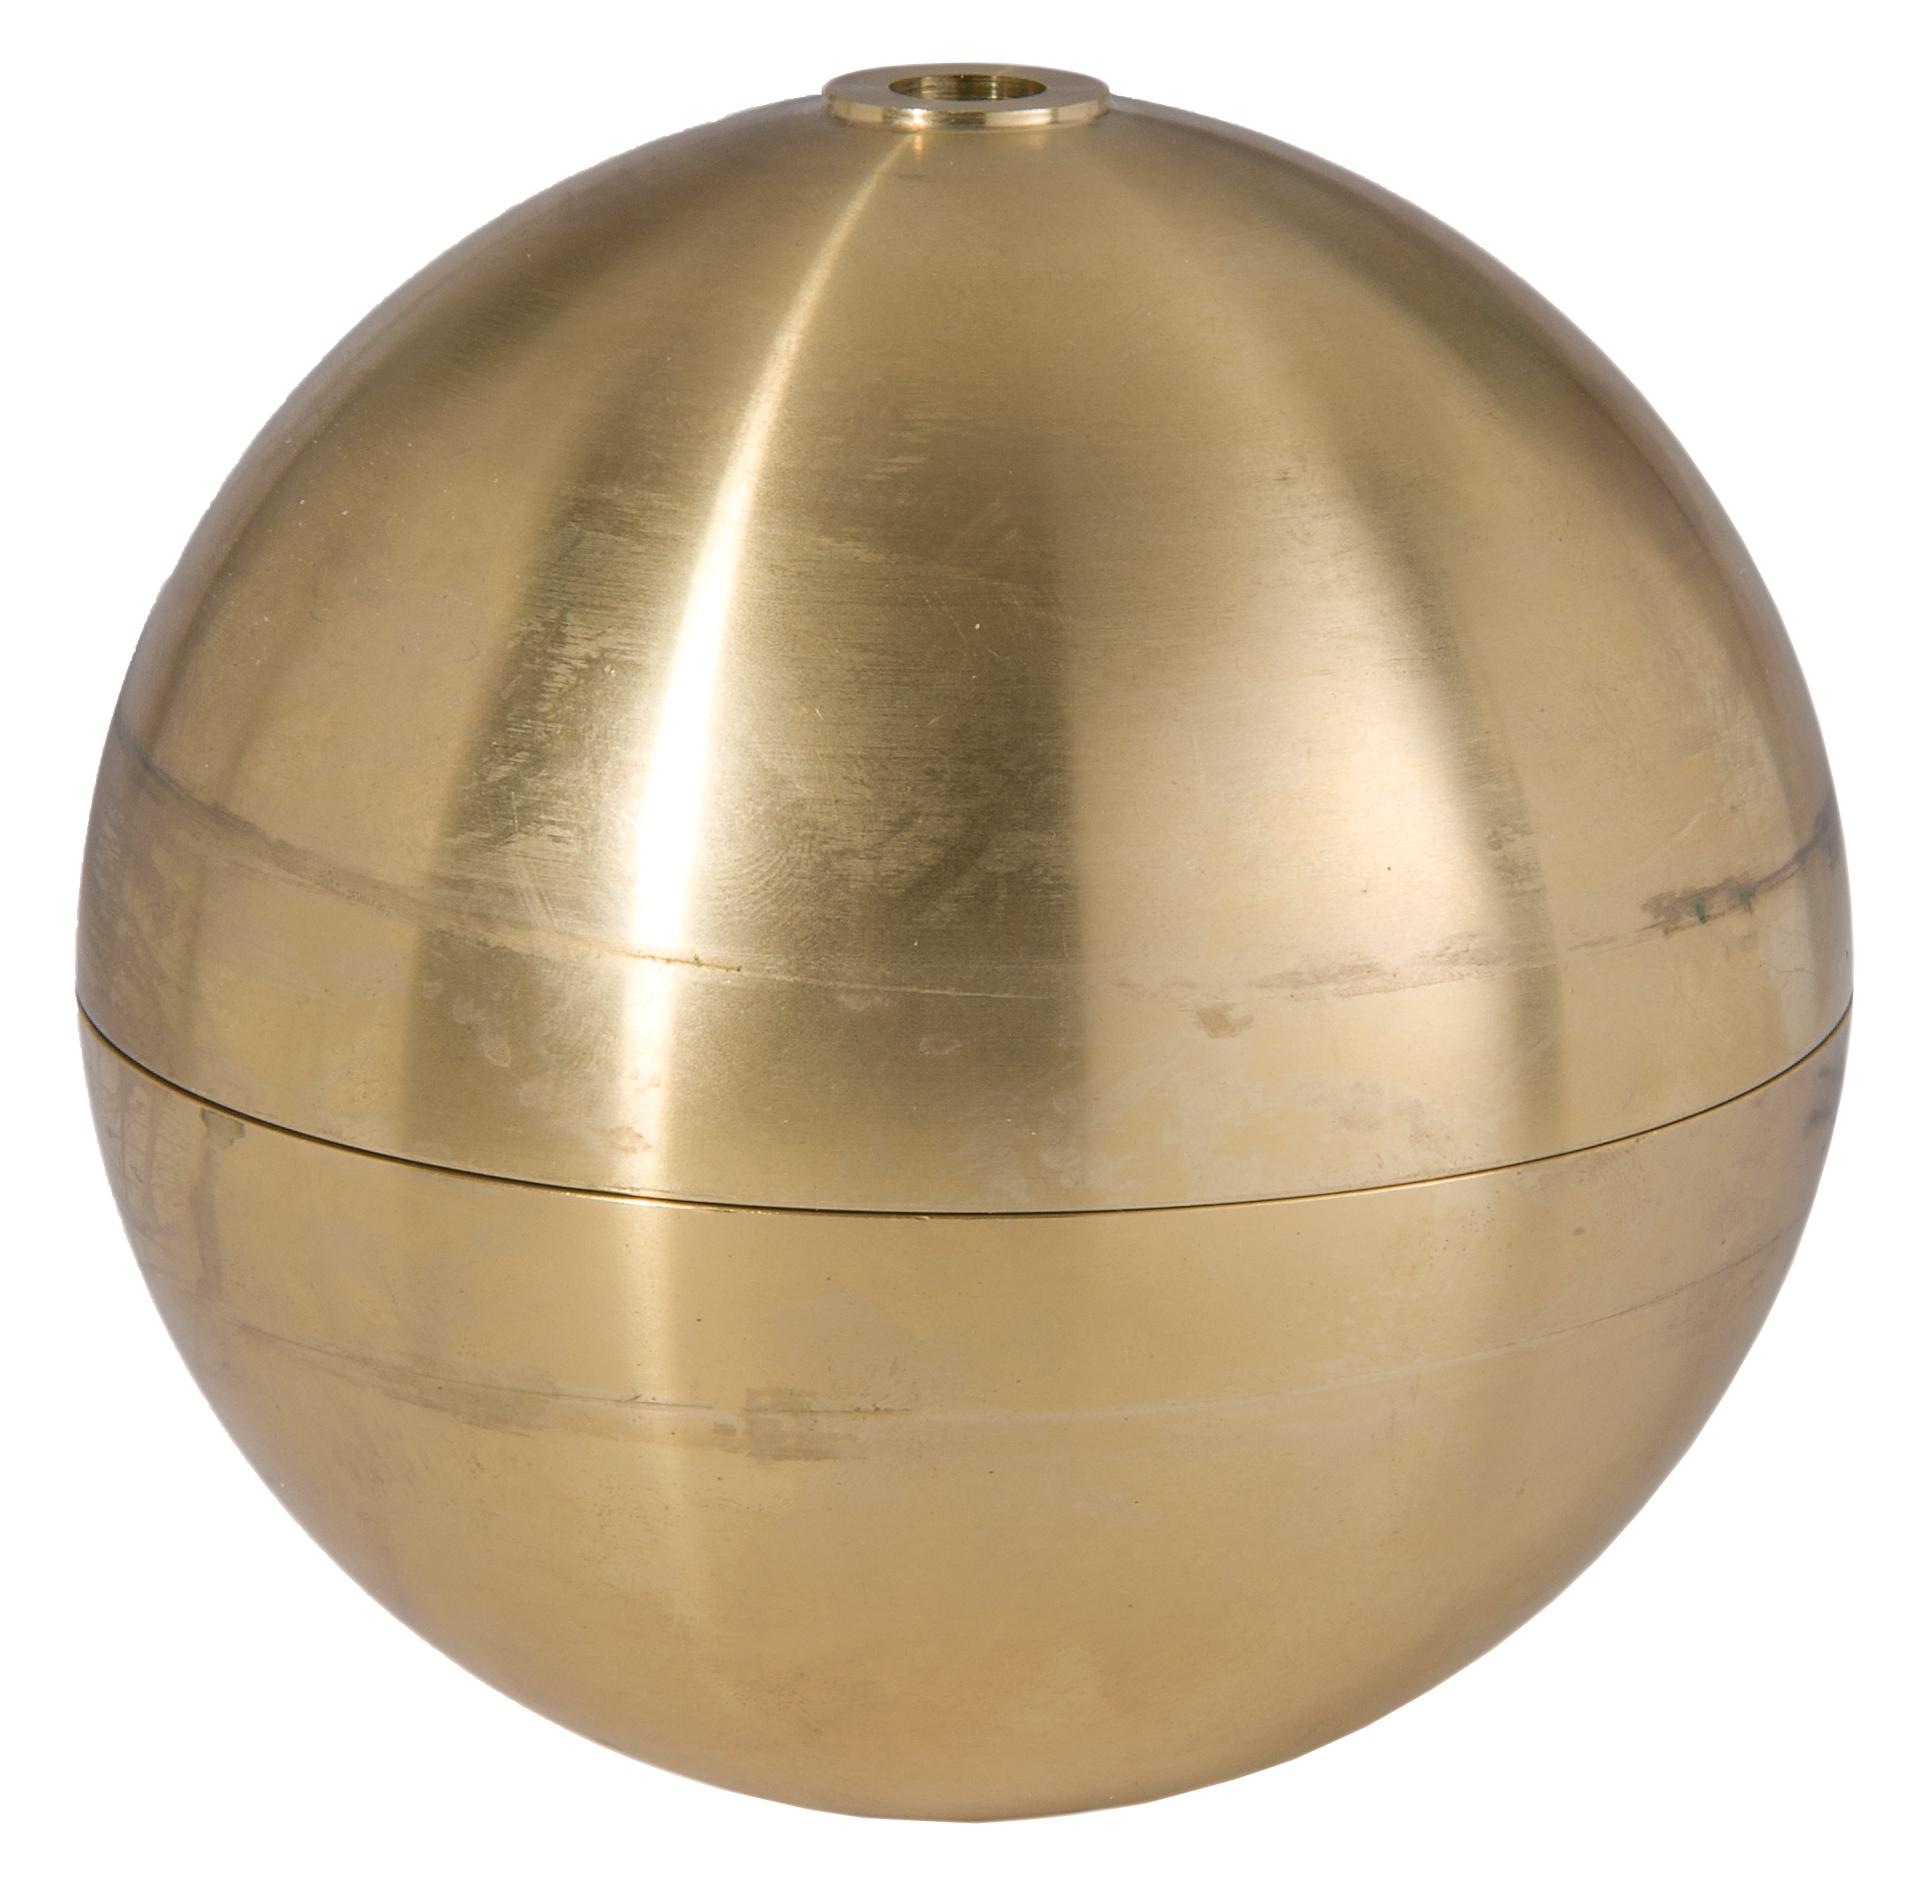 Metal Ball Lamp Shade: Large Hollow Brass Ball 11647U